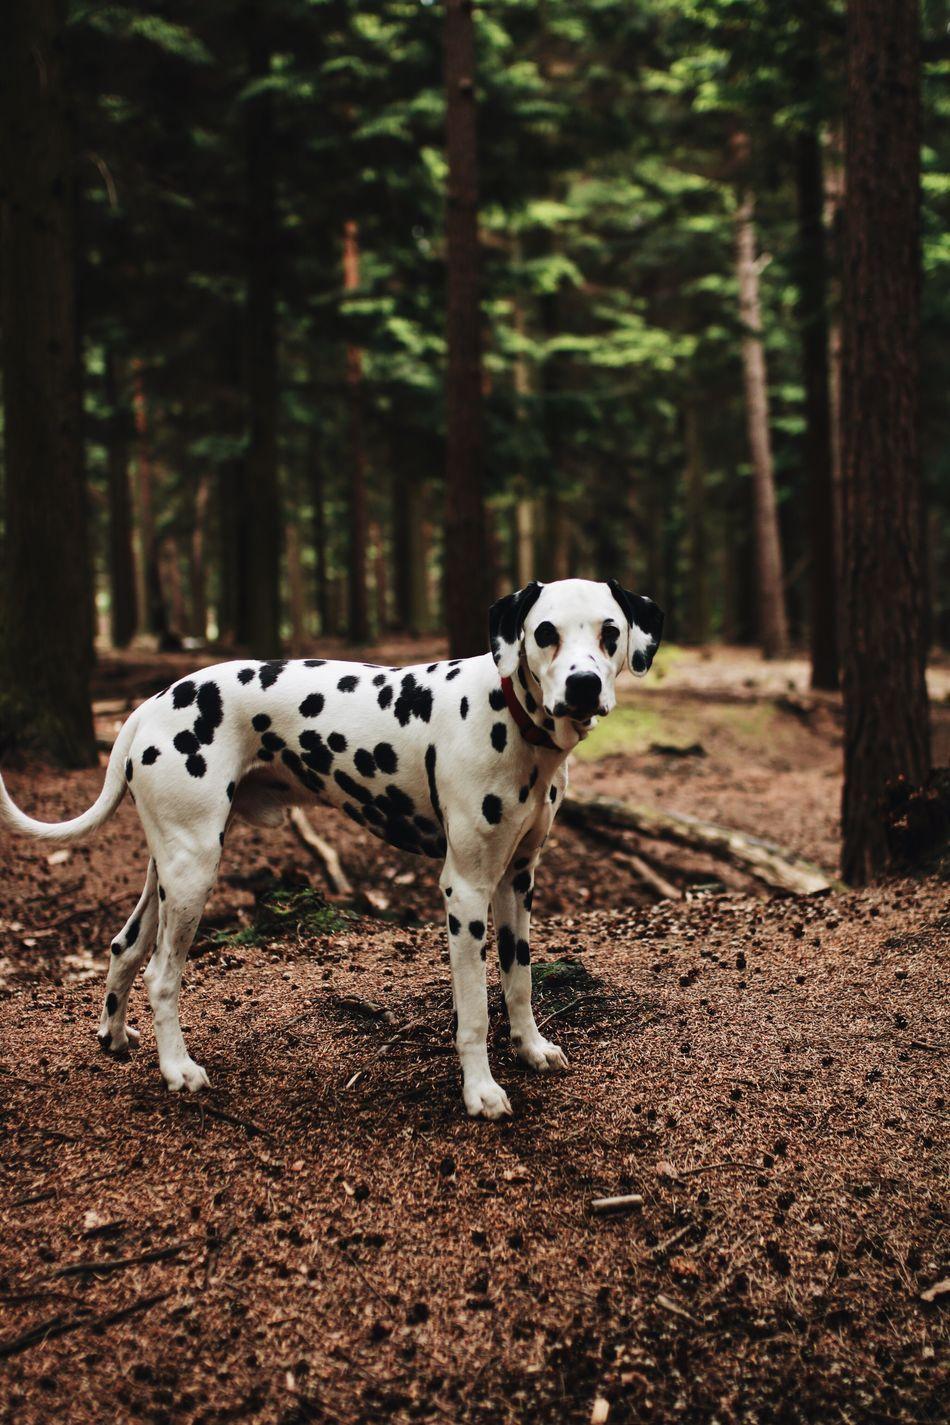 Dalmatian Dog Animal Themes Spotted Mammal Domestic Animals Pets